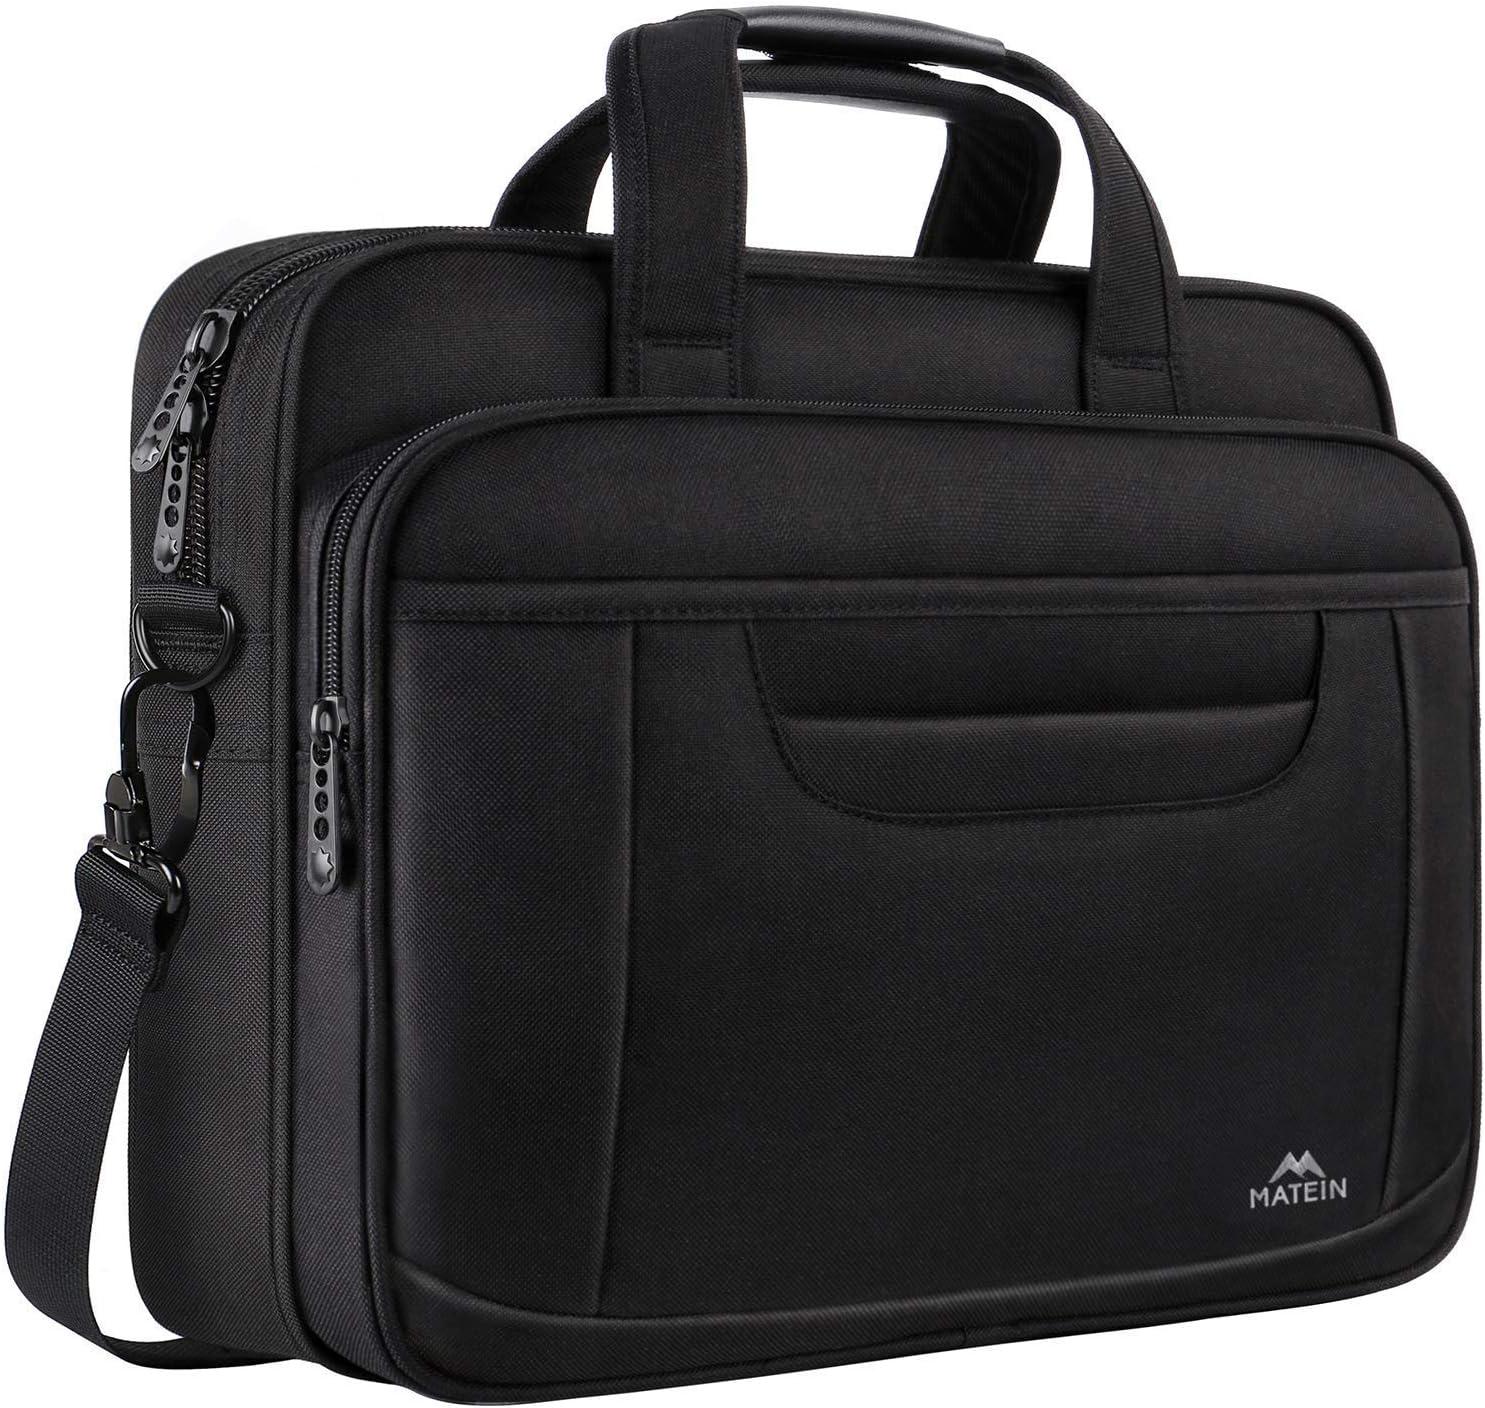 15.6 Inch Laptop Bag, Water Resisatant Briefcase Laptop Case for Men Women, Stylish Nylon Multi-Functional Computer Shoulder Bag for Business Travel School, Fit 15.6 15 Inch Laptop, Black